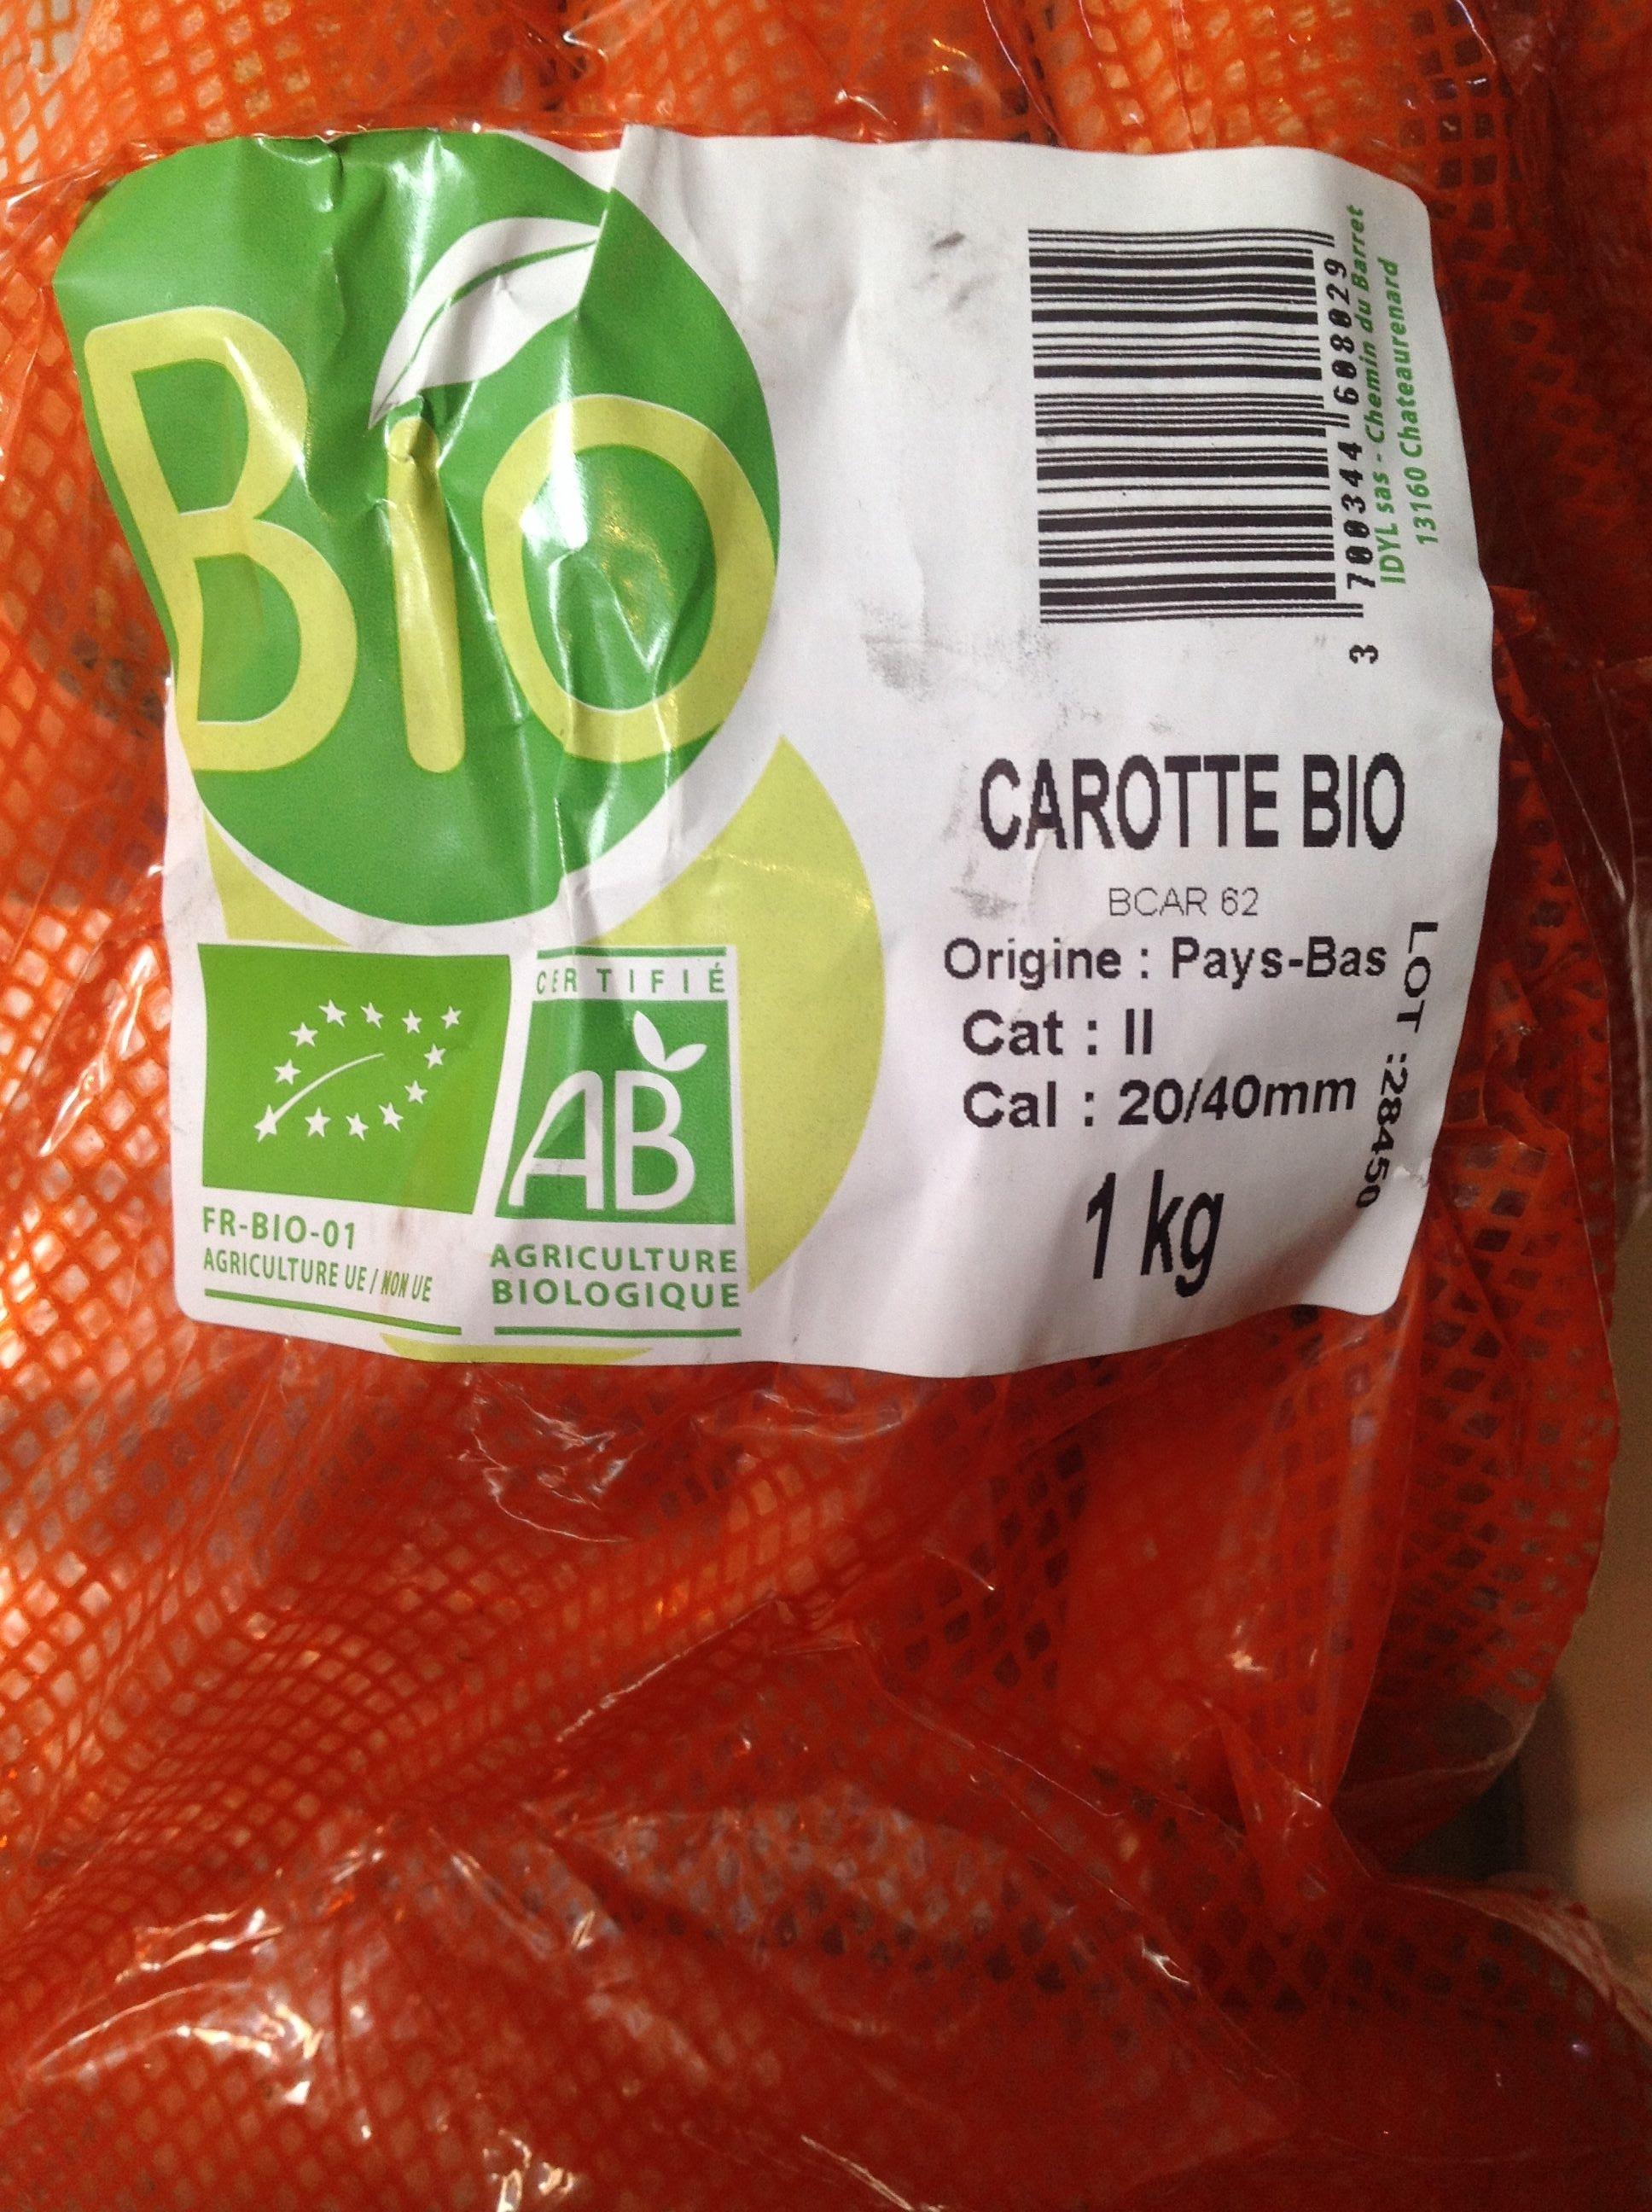 Carotte bio - Product